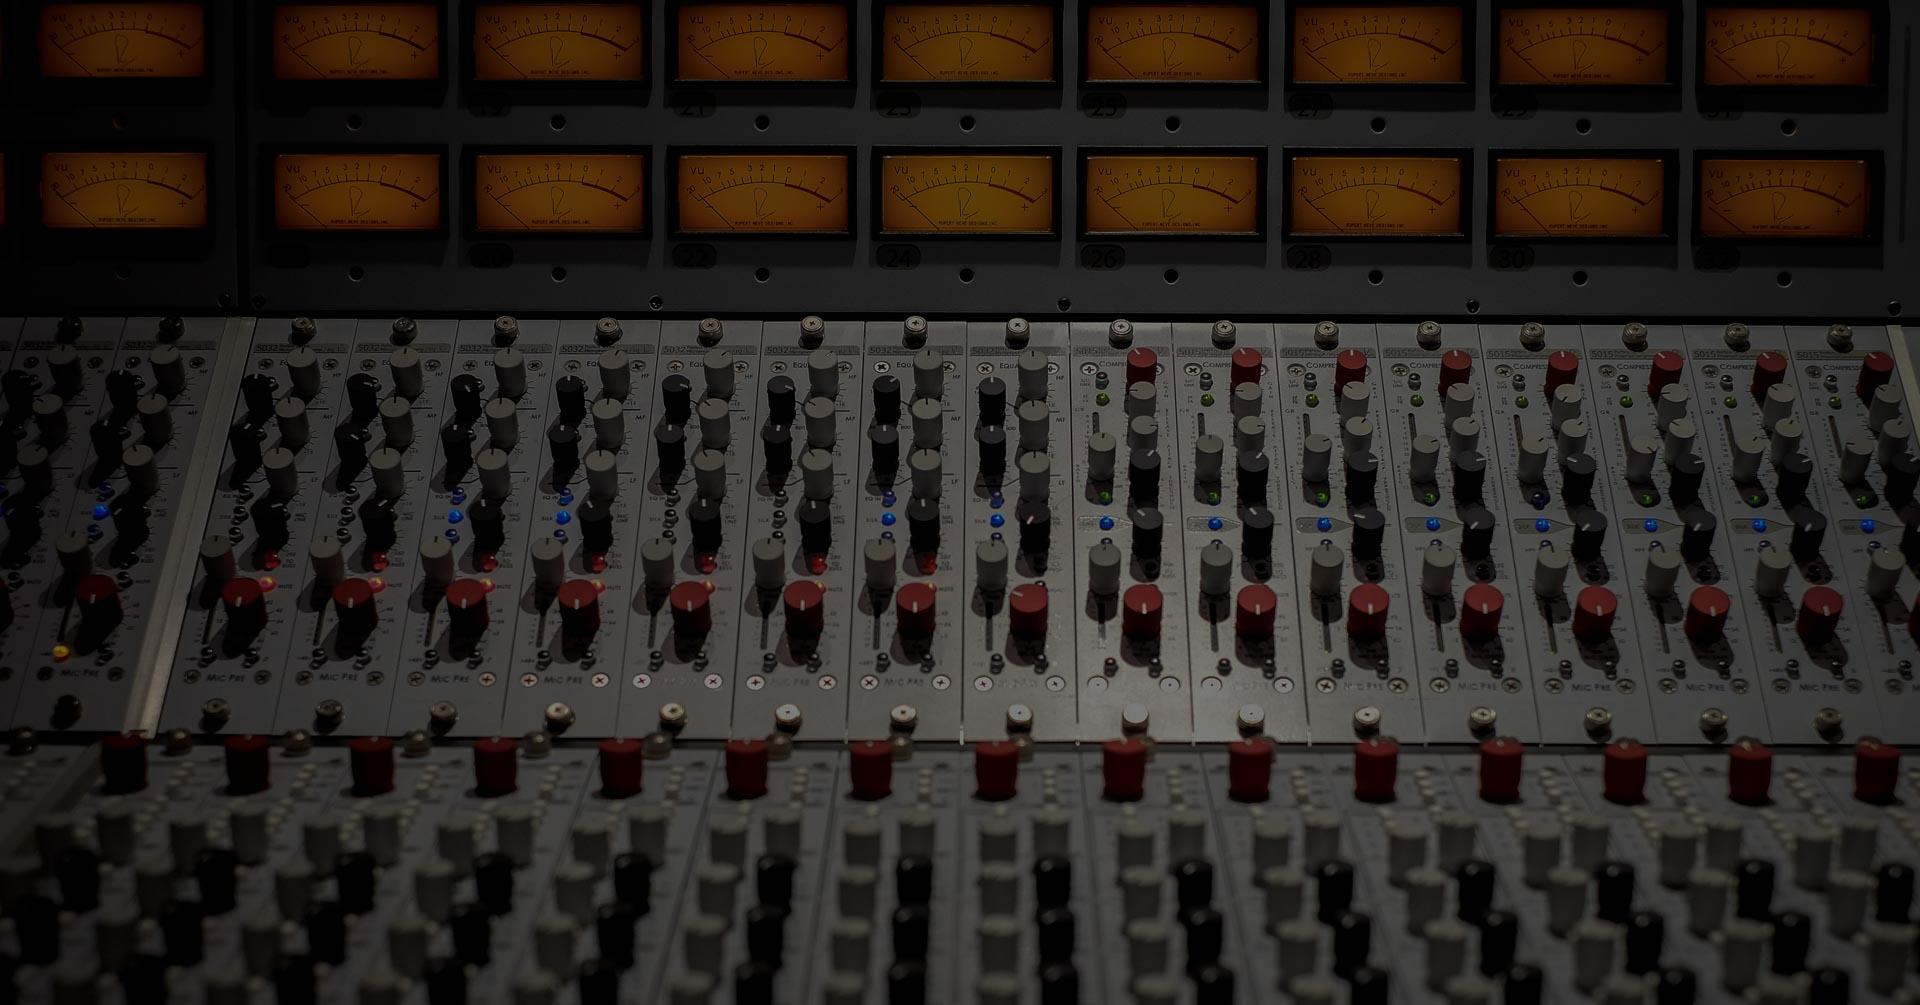 Spitfire Audio comes to Gorbals Sound! - Gorbals Sound